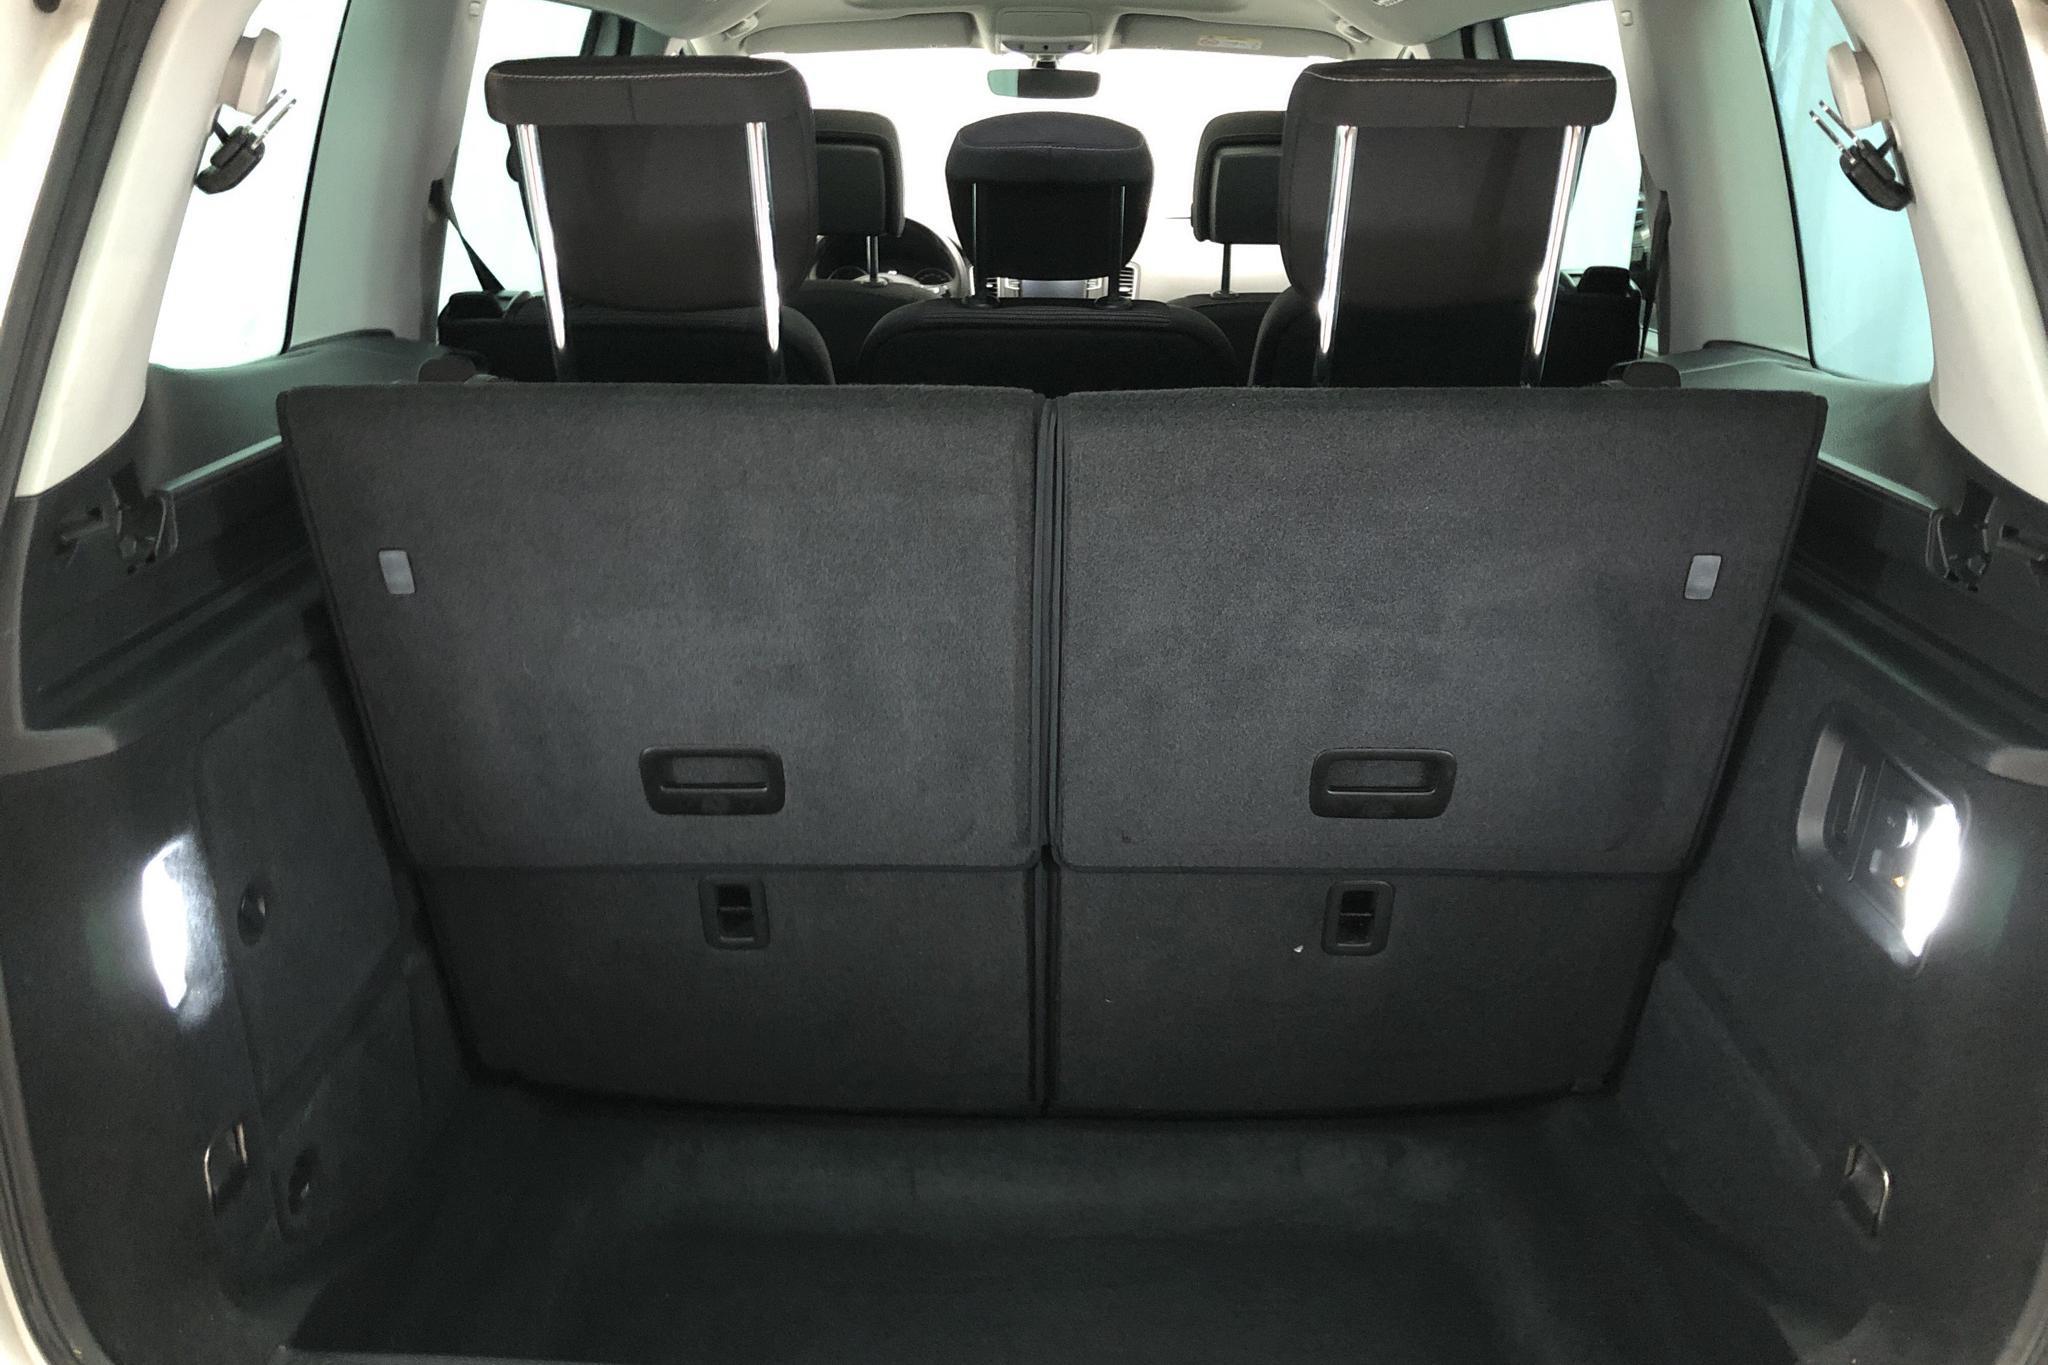 VW Sharan 2.0 TDI (150hk) - 4 406 mil - Automat - vit - 2019